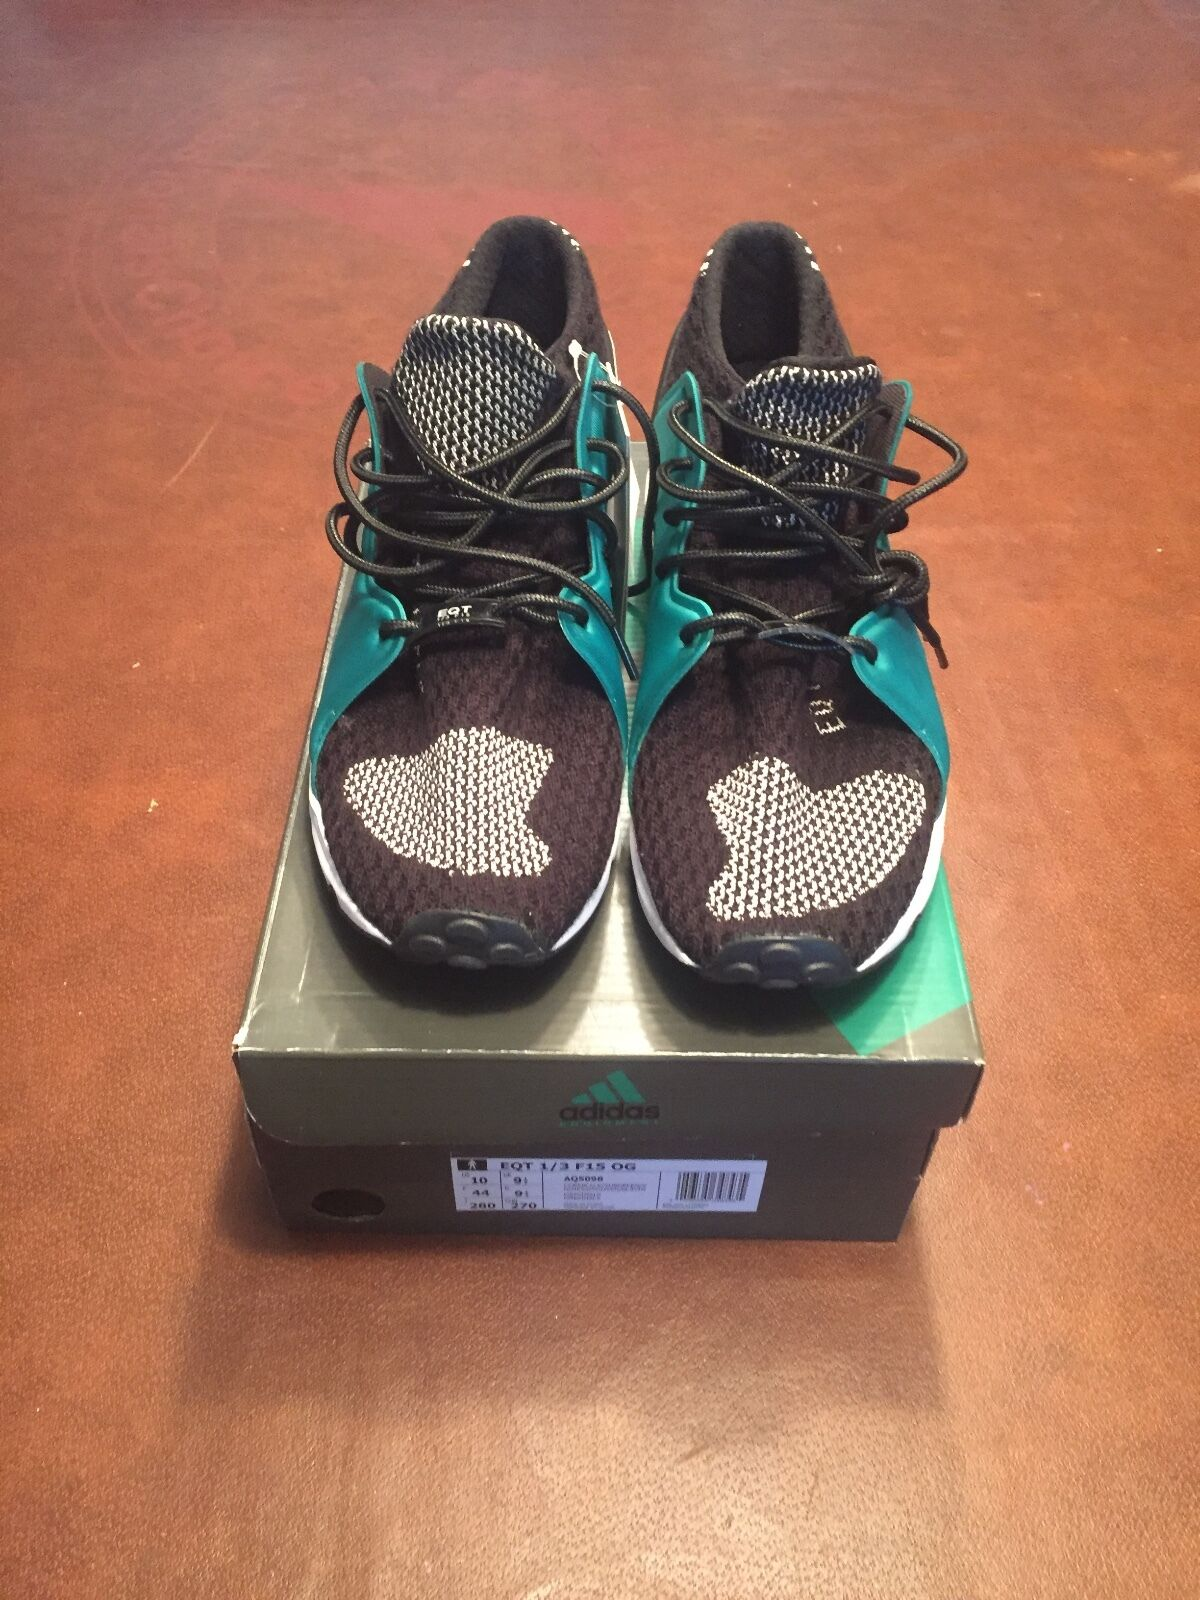 Adidas EQT 1/3 F15 OG Green black primeknit Price reduction